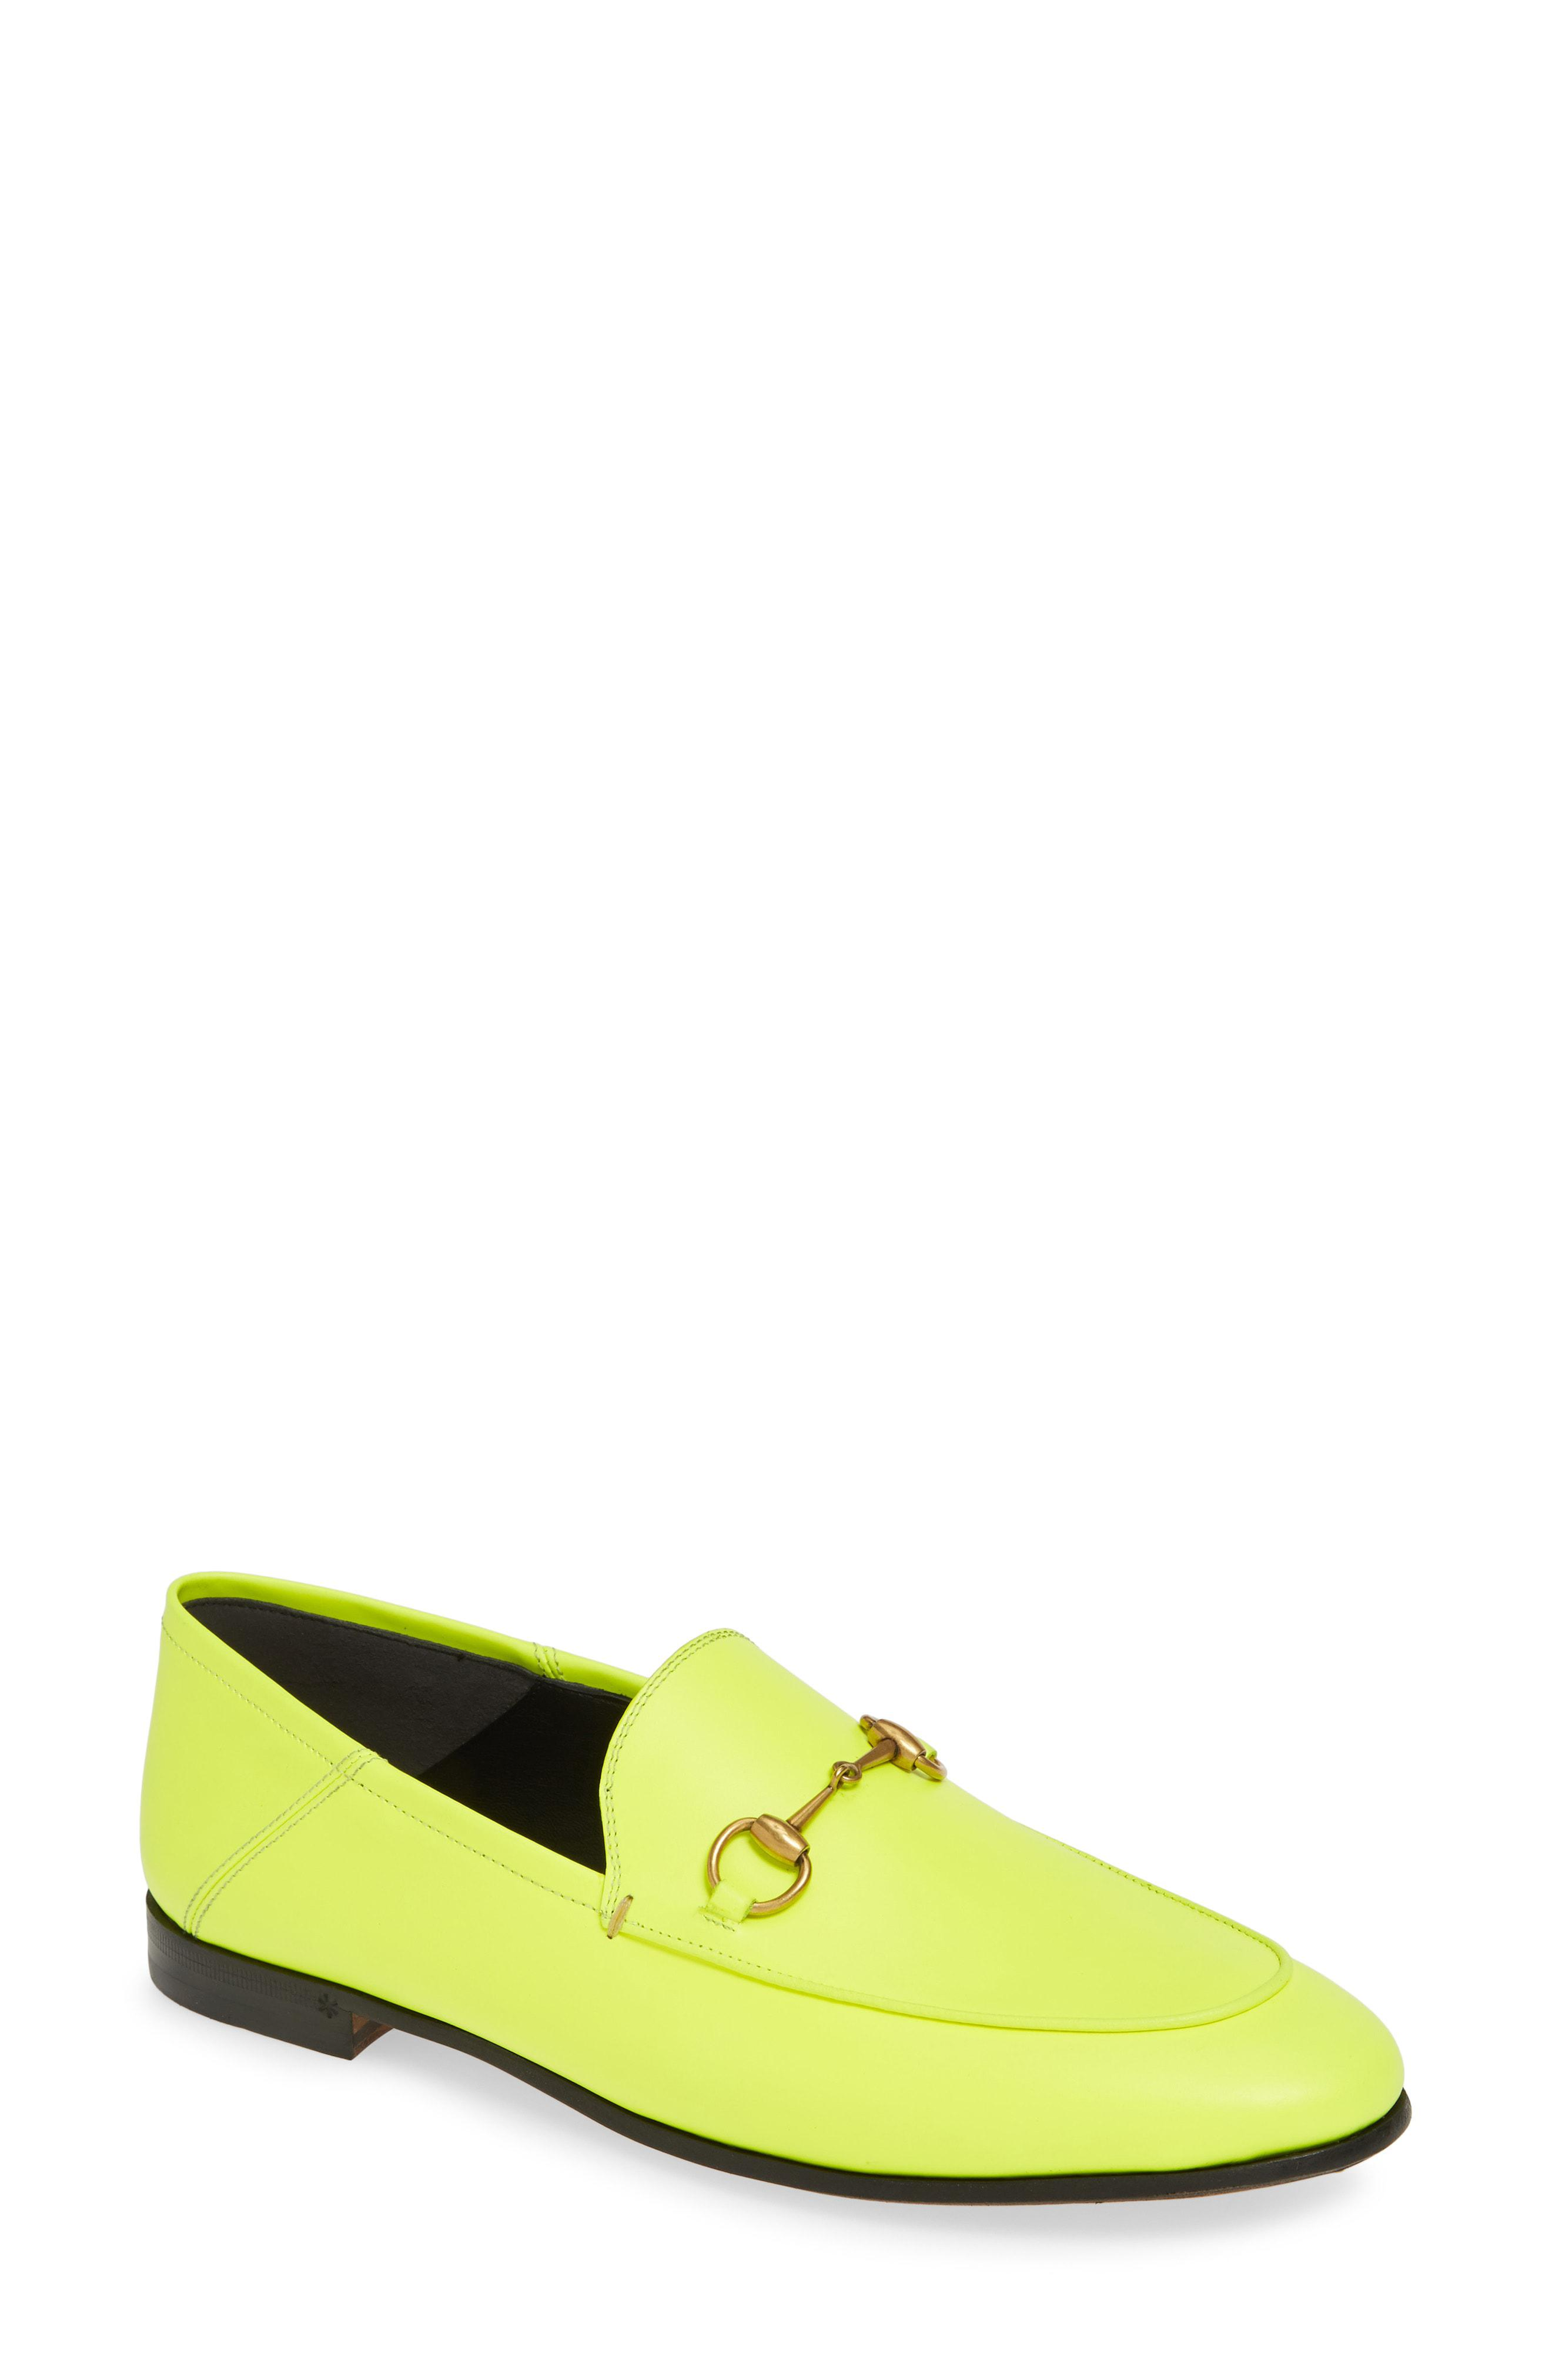 e87f9418246 Gucci. Women s Leather Horsebit Loafer